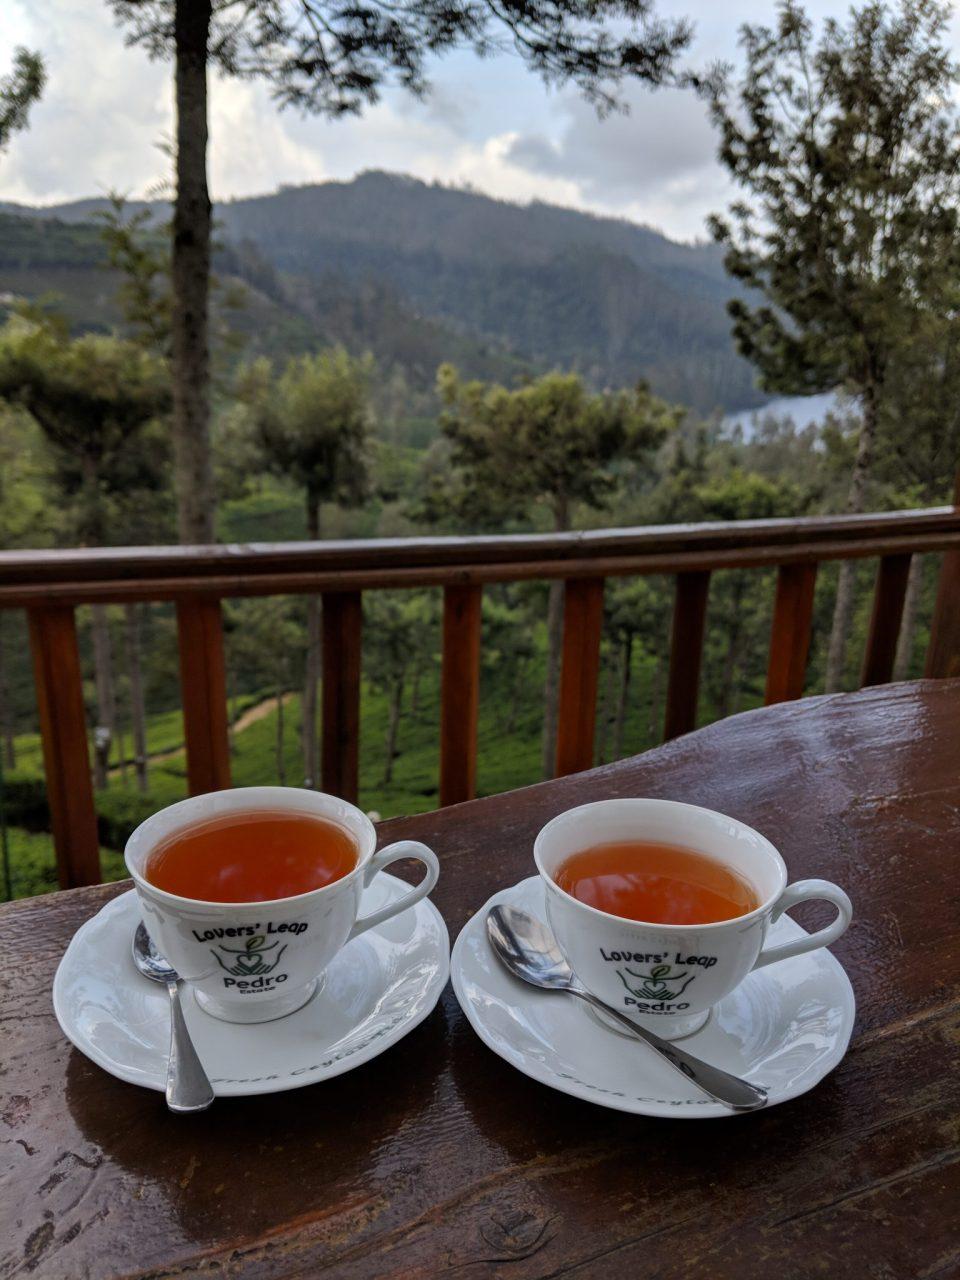 Pedro's Tea Estate